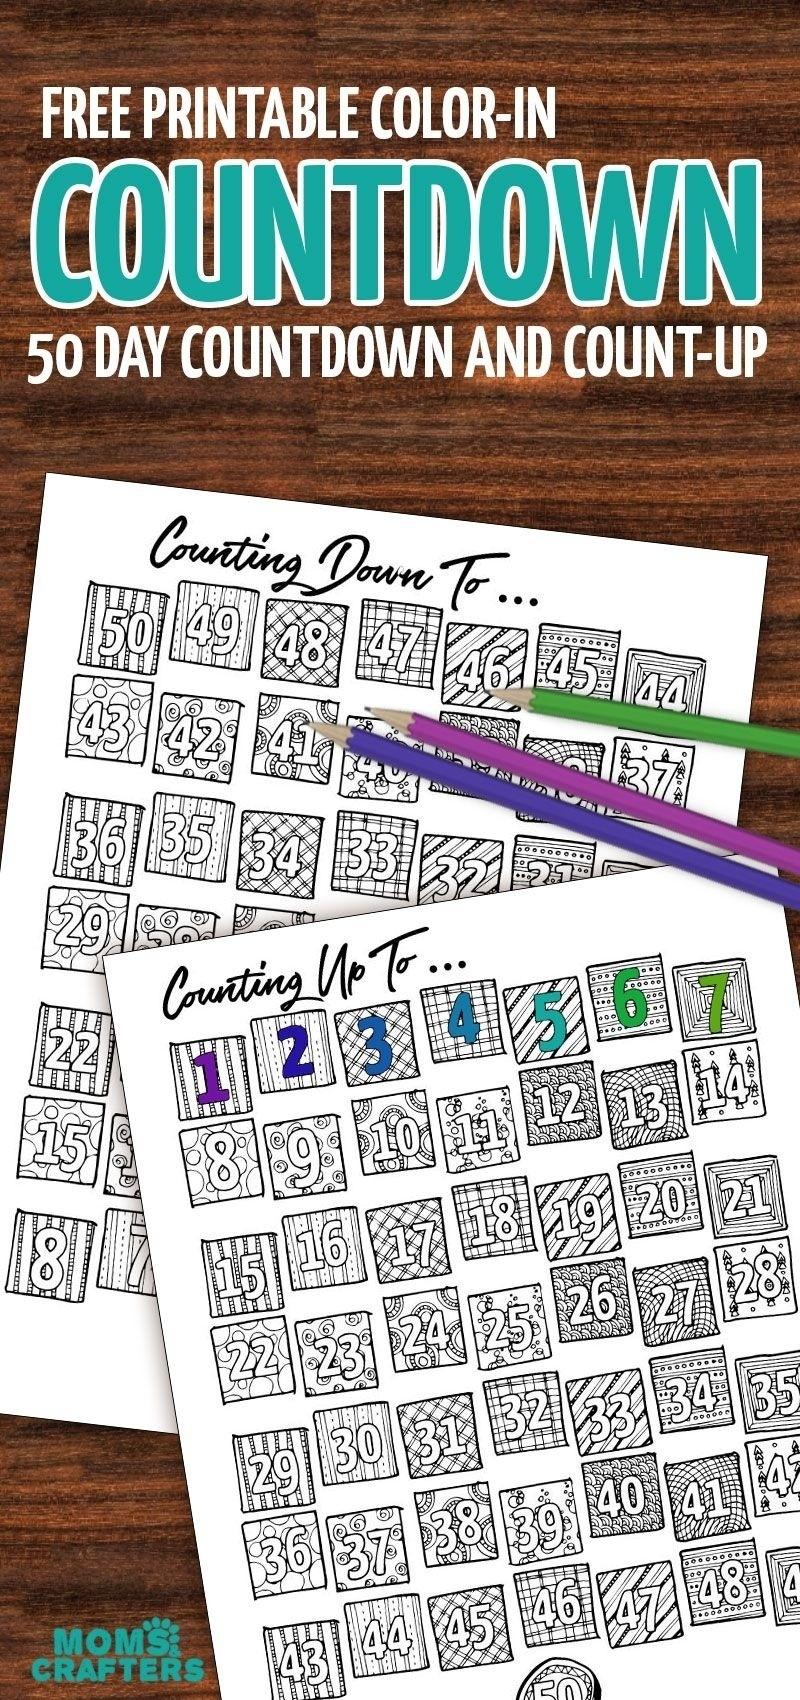 6 Month Countdown Calendar • Printable Blank Calendar Template_6 Month Countdown Calendar